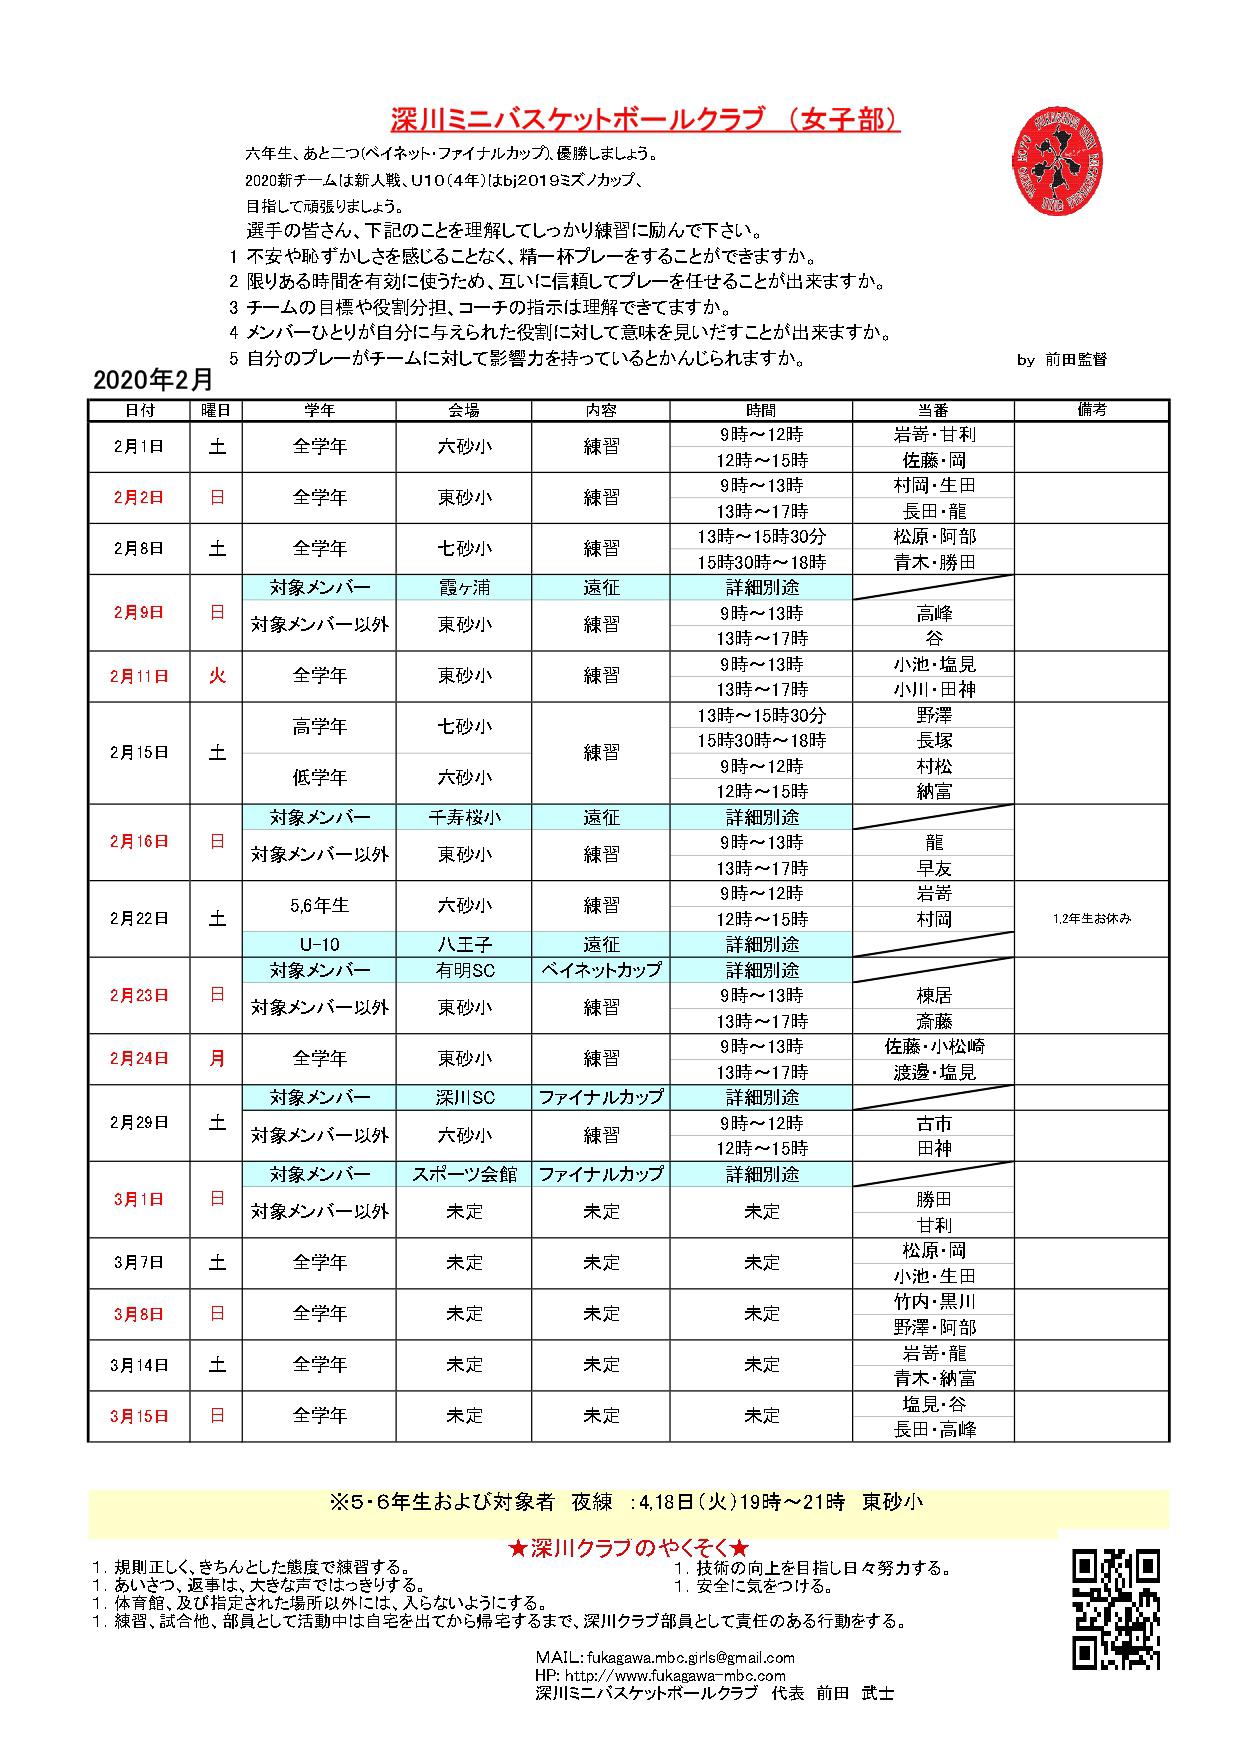 B56CEDB8-741C-4830-9D93-15758C8BBBEE